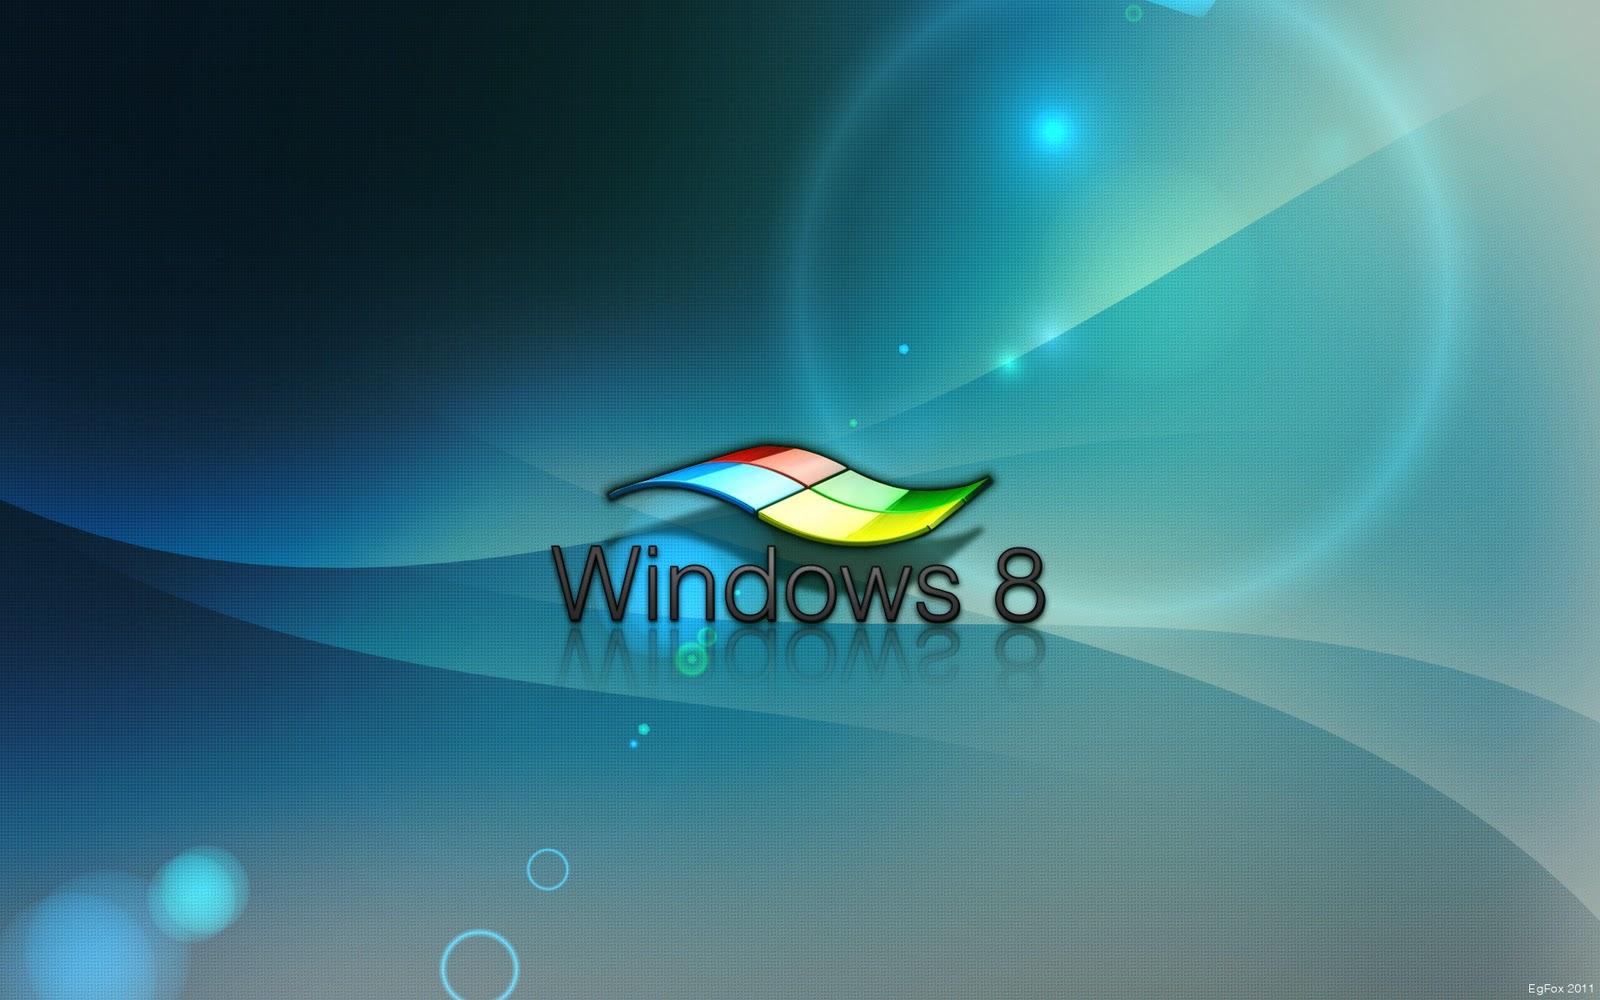 hd windows logo wallpapers - wallpapersafari